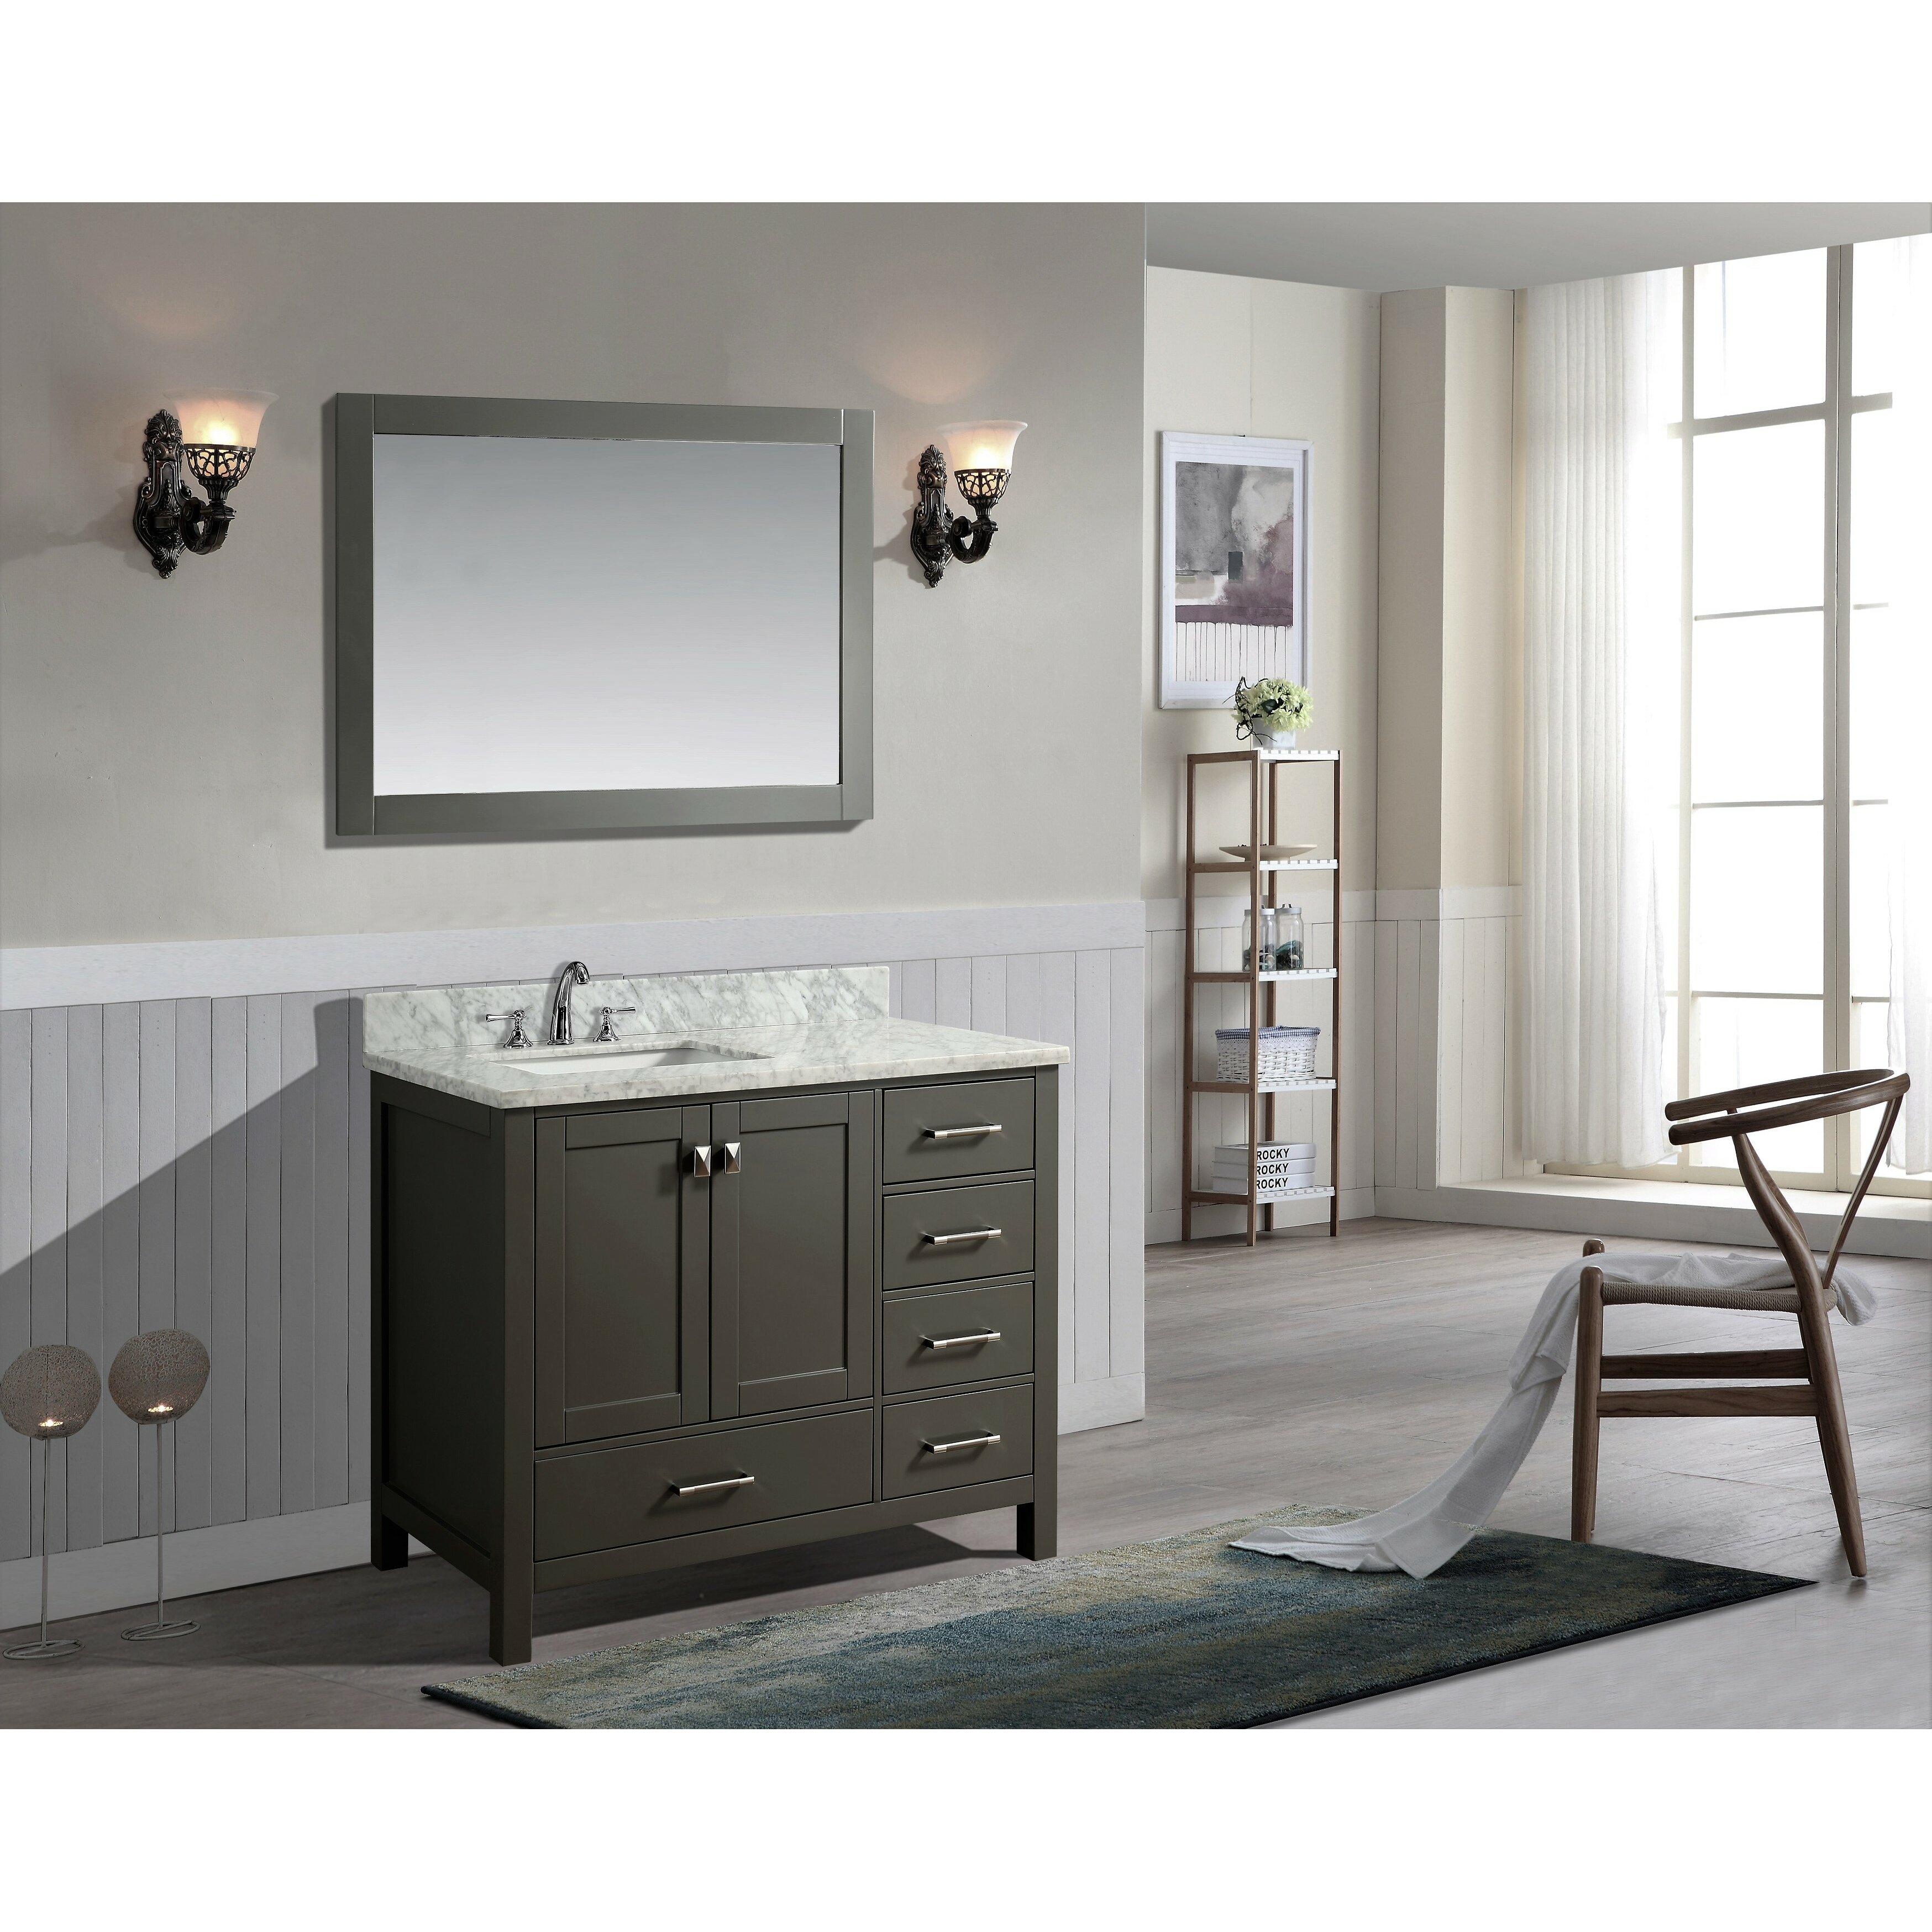 ari kitchen bath bella 42 single bathroom vanity set with mirror reviews wayfair